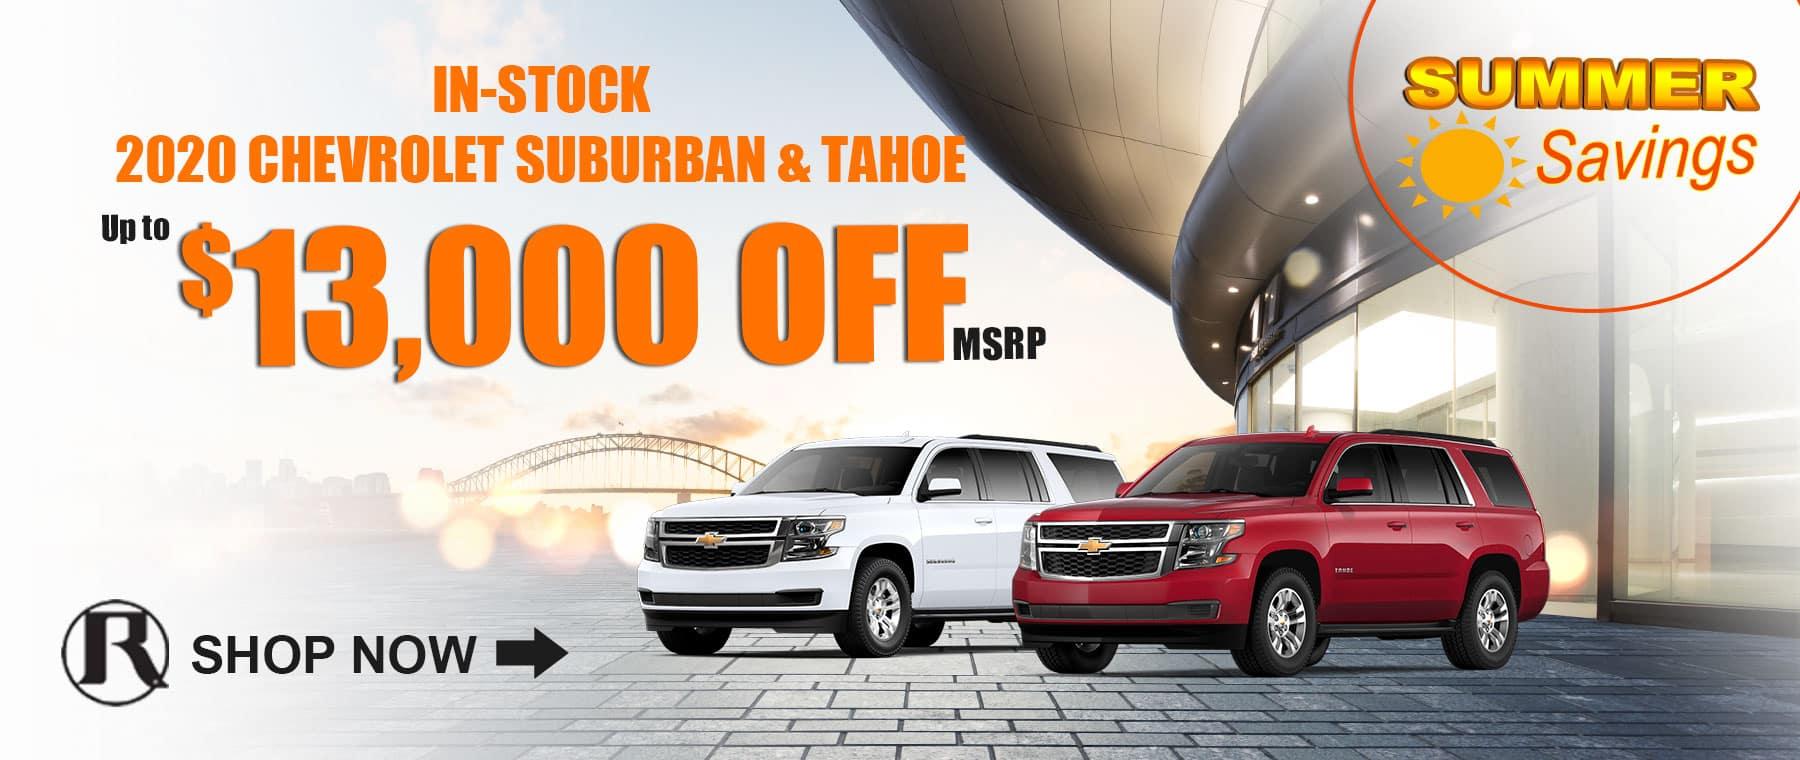 2020 Chevrolet Tahoe & Suburban